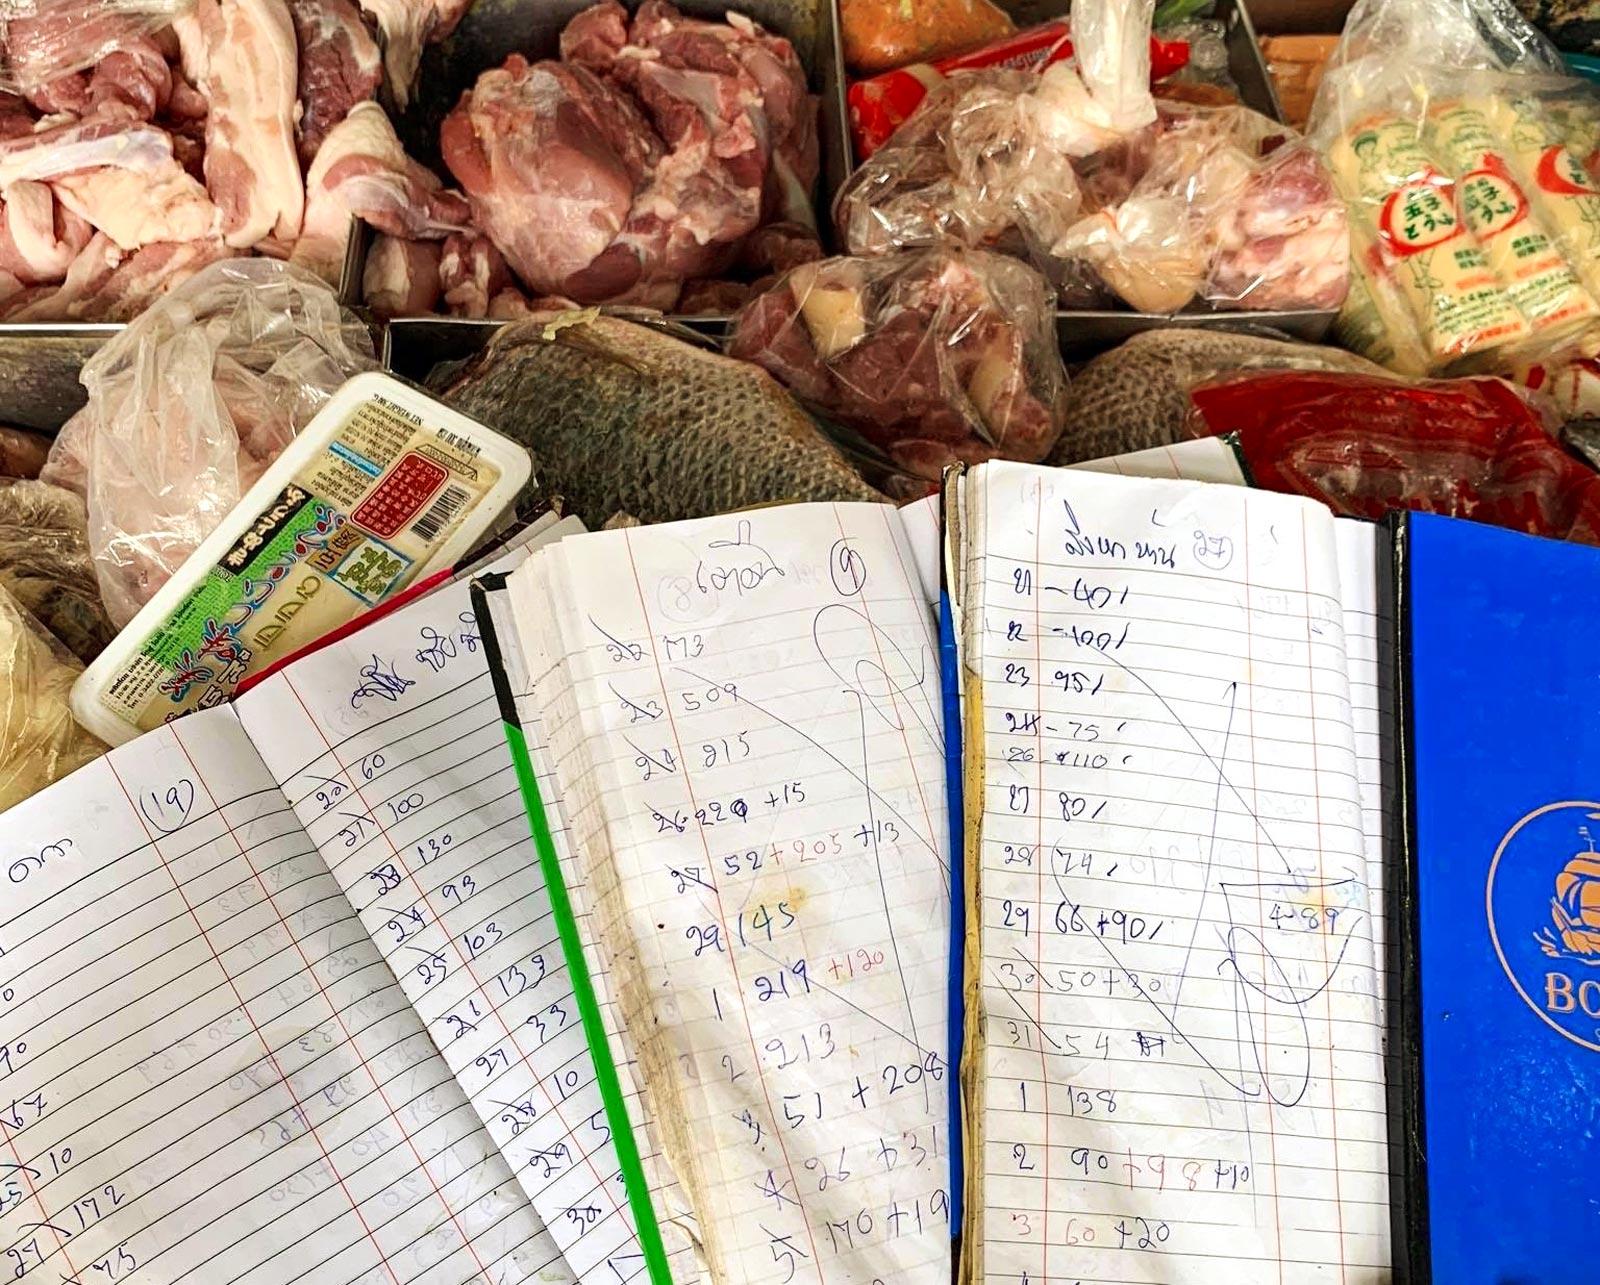 Meals on wheels: Pandemic highlights vital role of Bangkok's food trucks